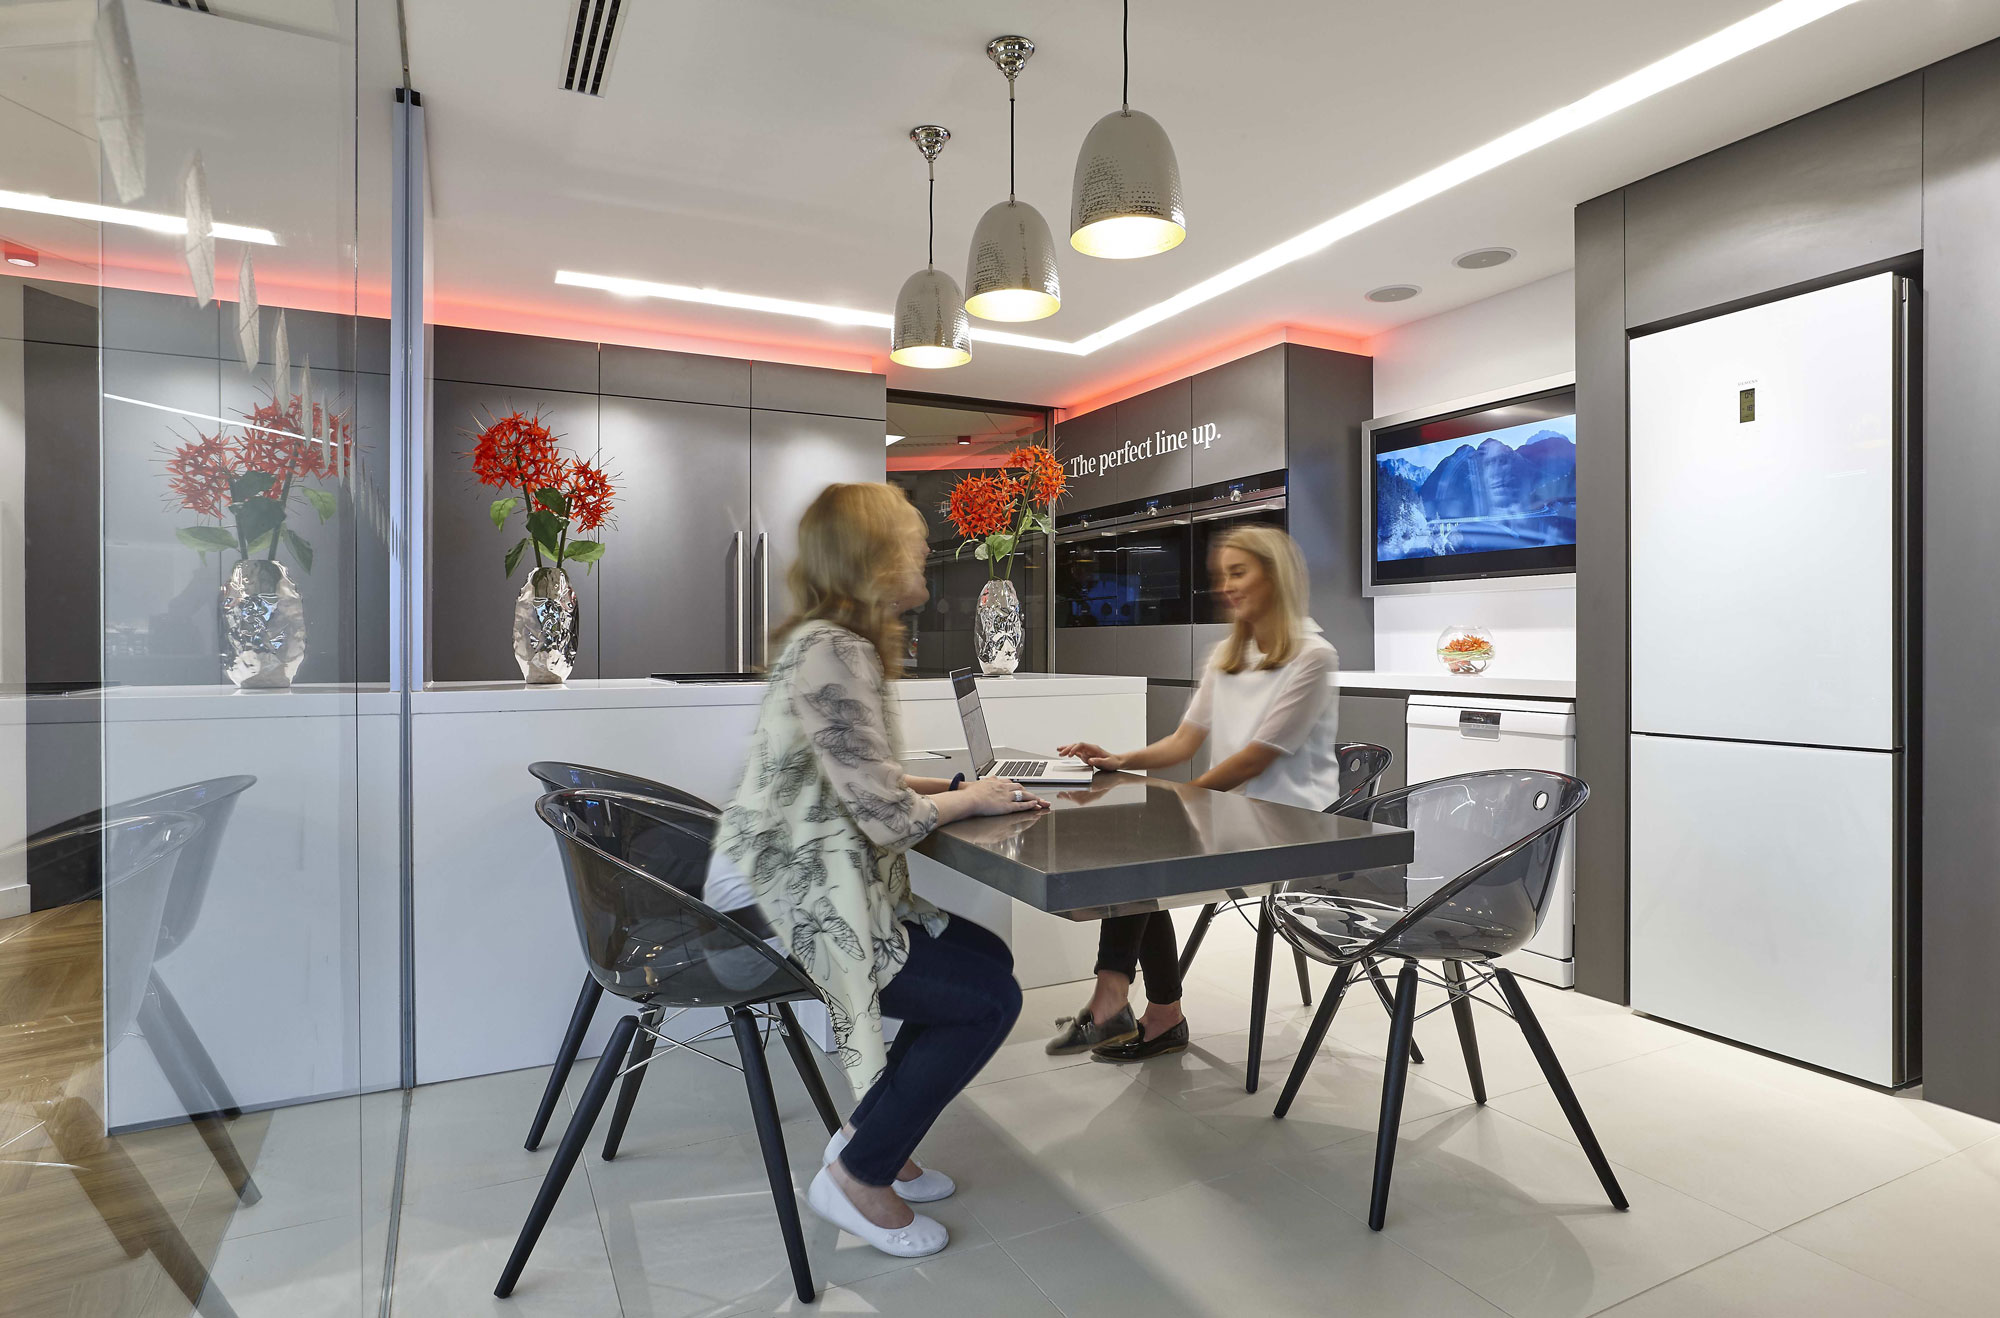 Bosch Siemens Neff Showroom Bosch Product Demonstration Area. Milton Keynes   London Interior Photographer